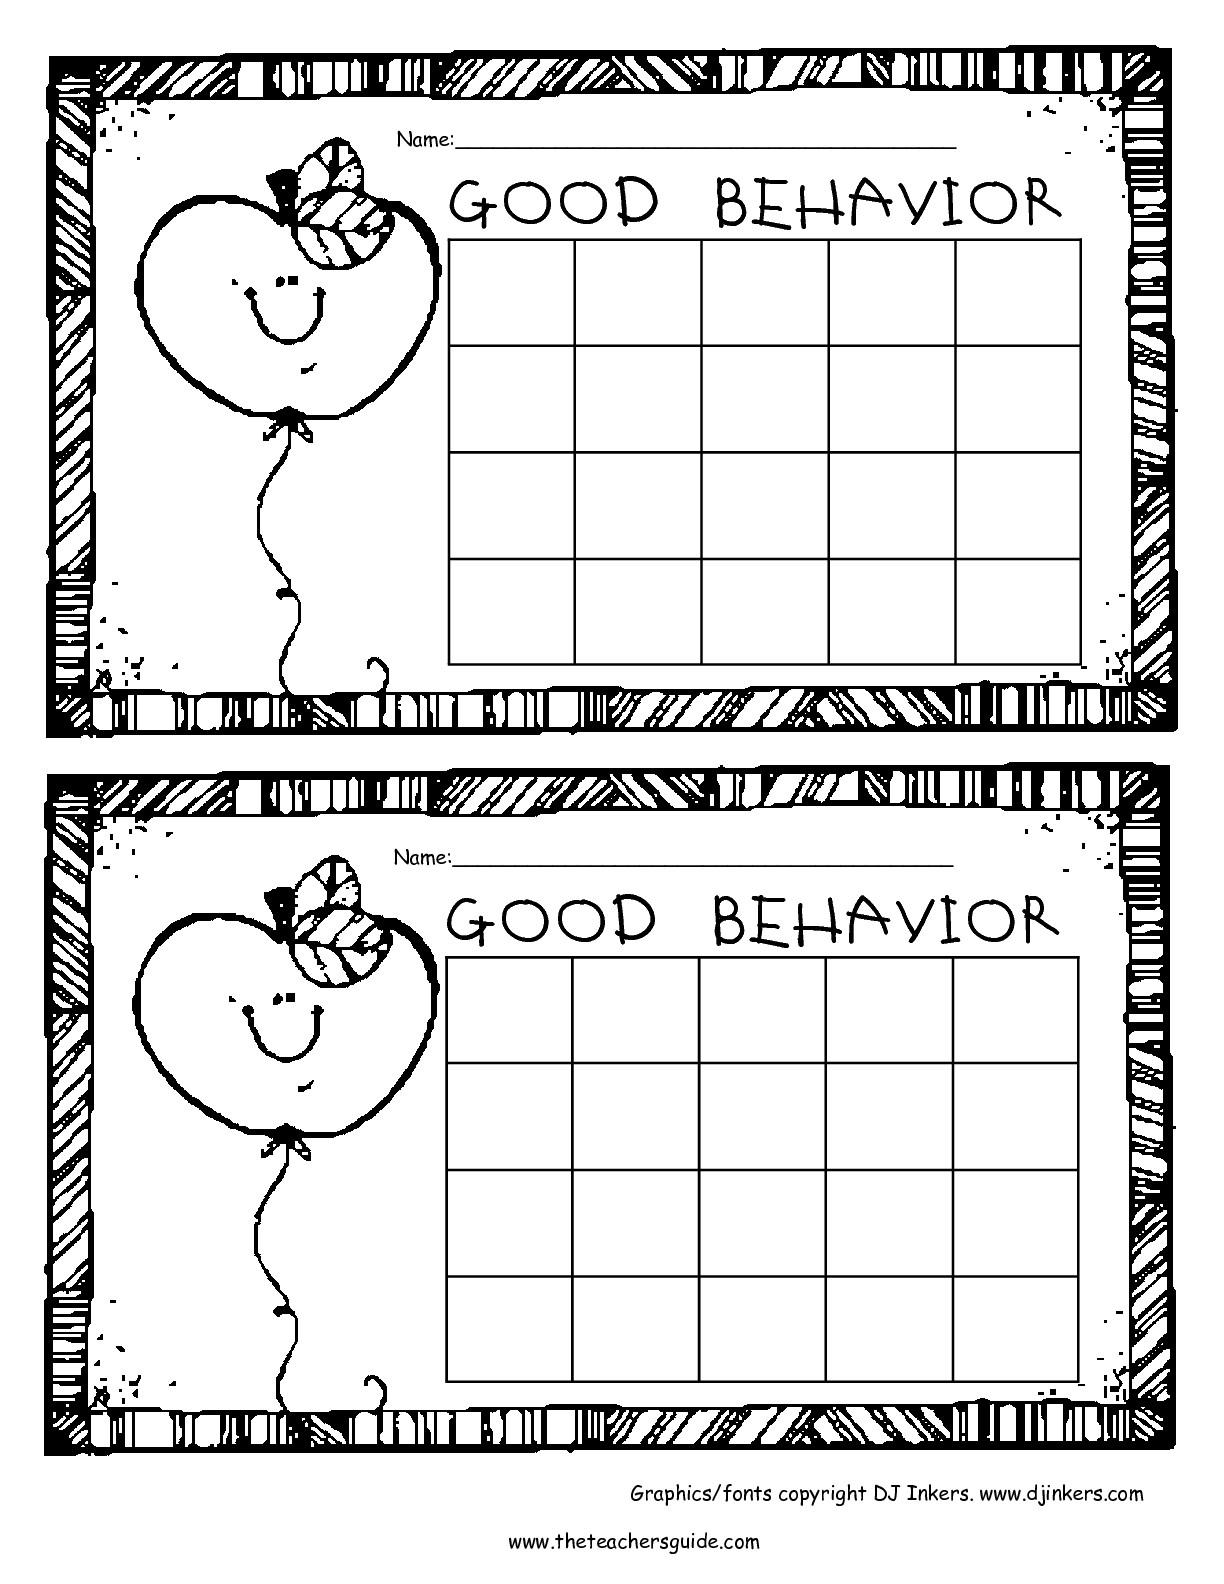 Free Printable Reward And Incentive Charts throughout Free Printable Behavior Chart Templates